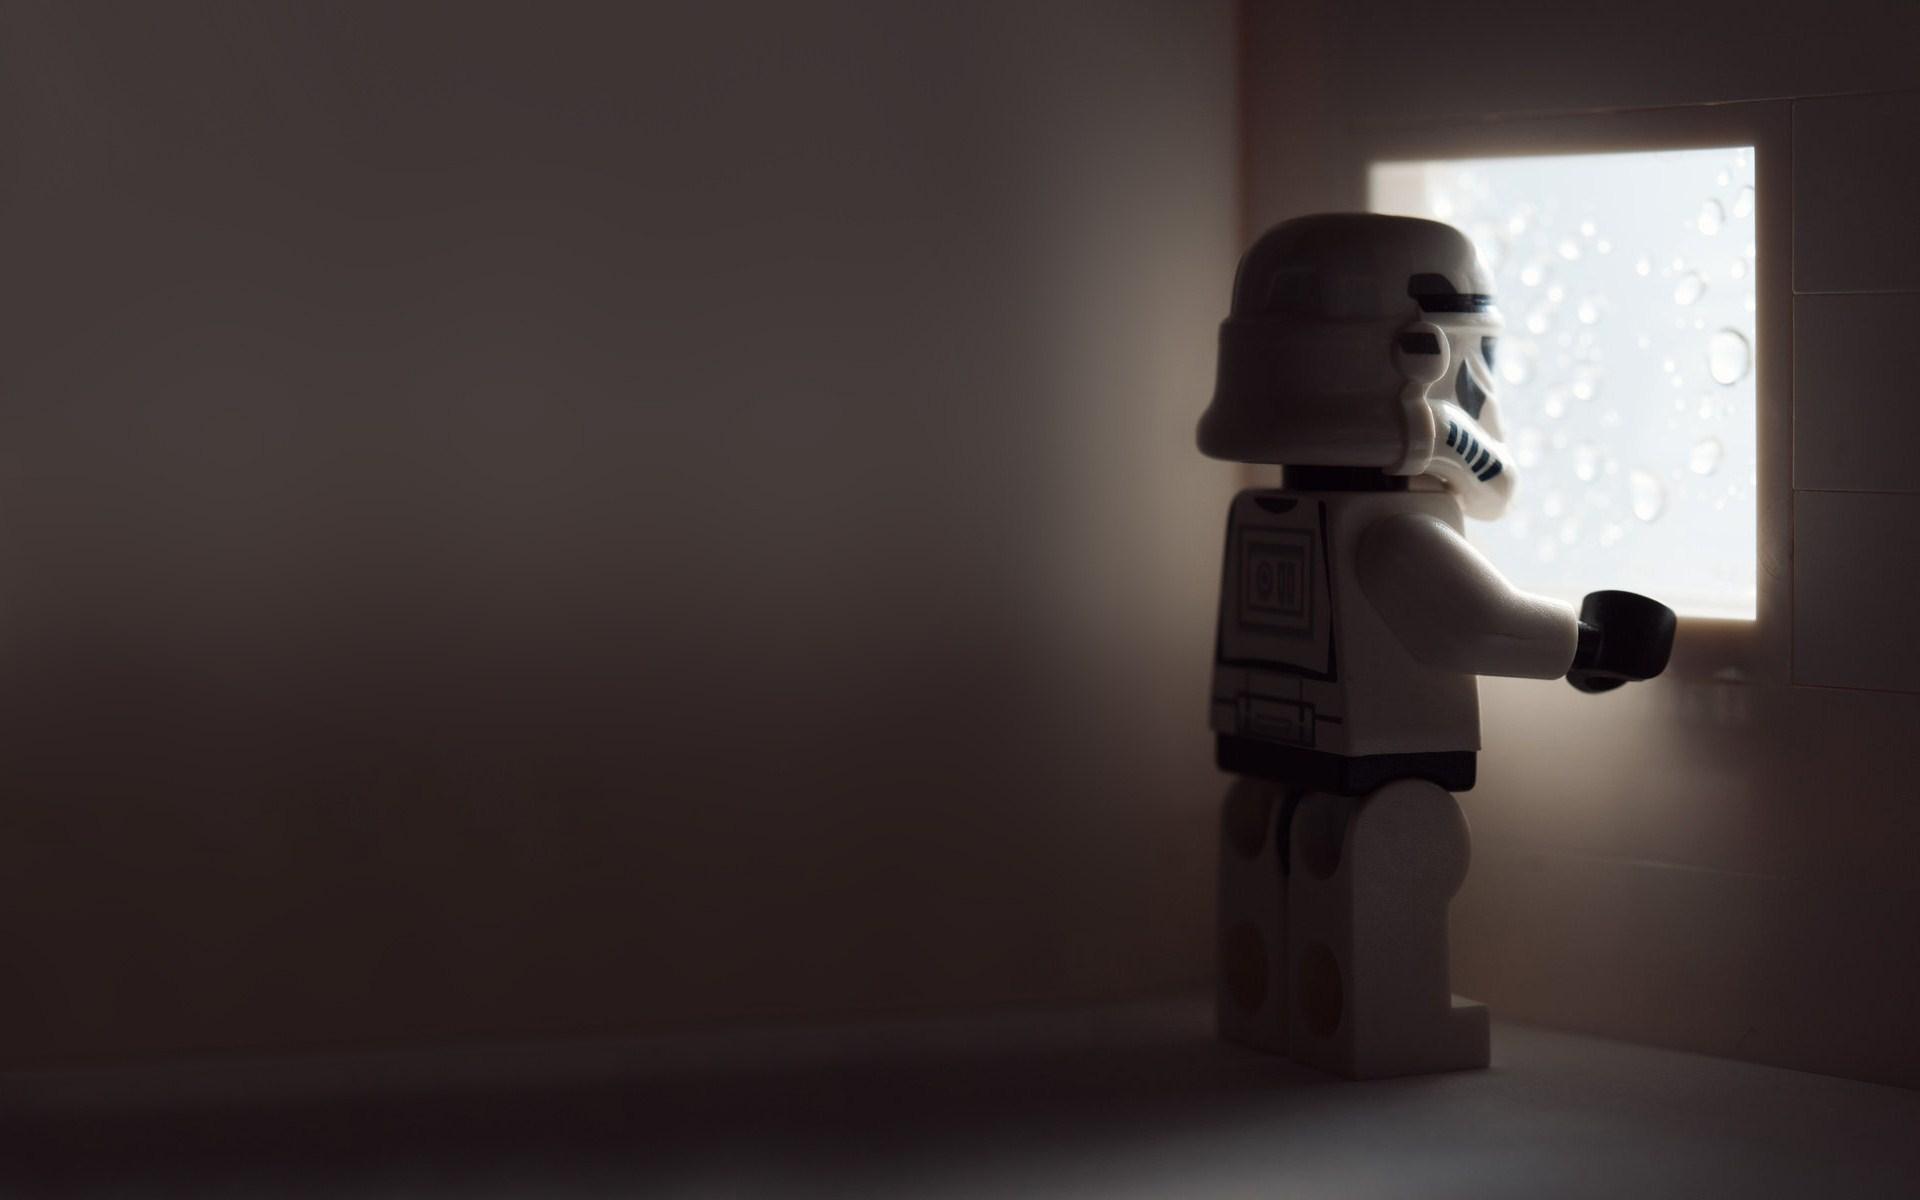 funny lego star wars wallpaper - wallpapersafari